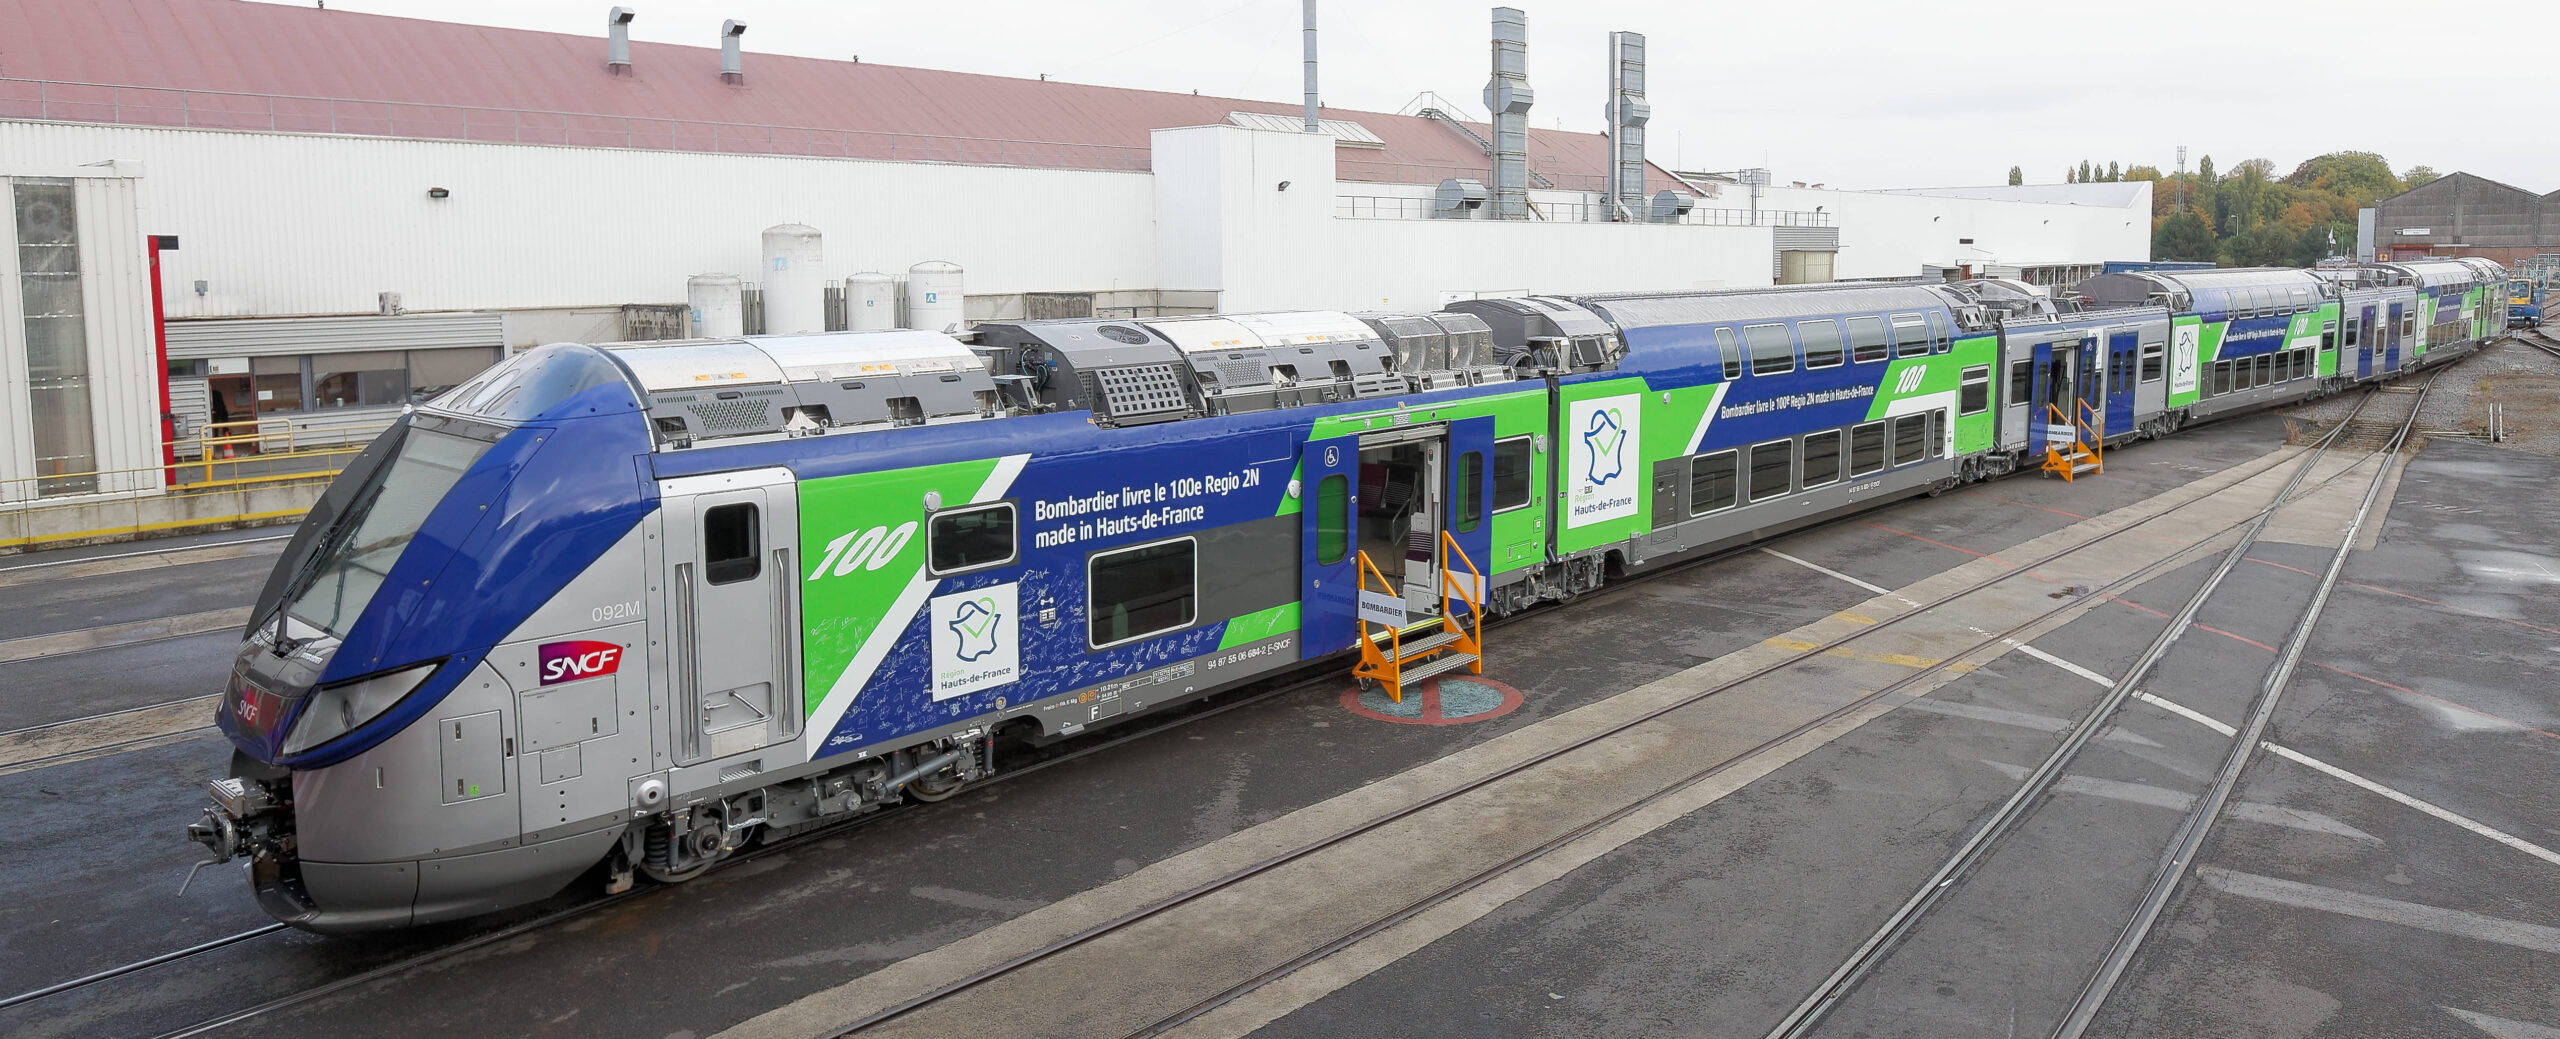 Bombardier OMNEO Regio 2N for Hauts-de-France